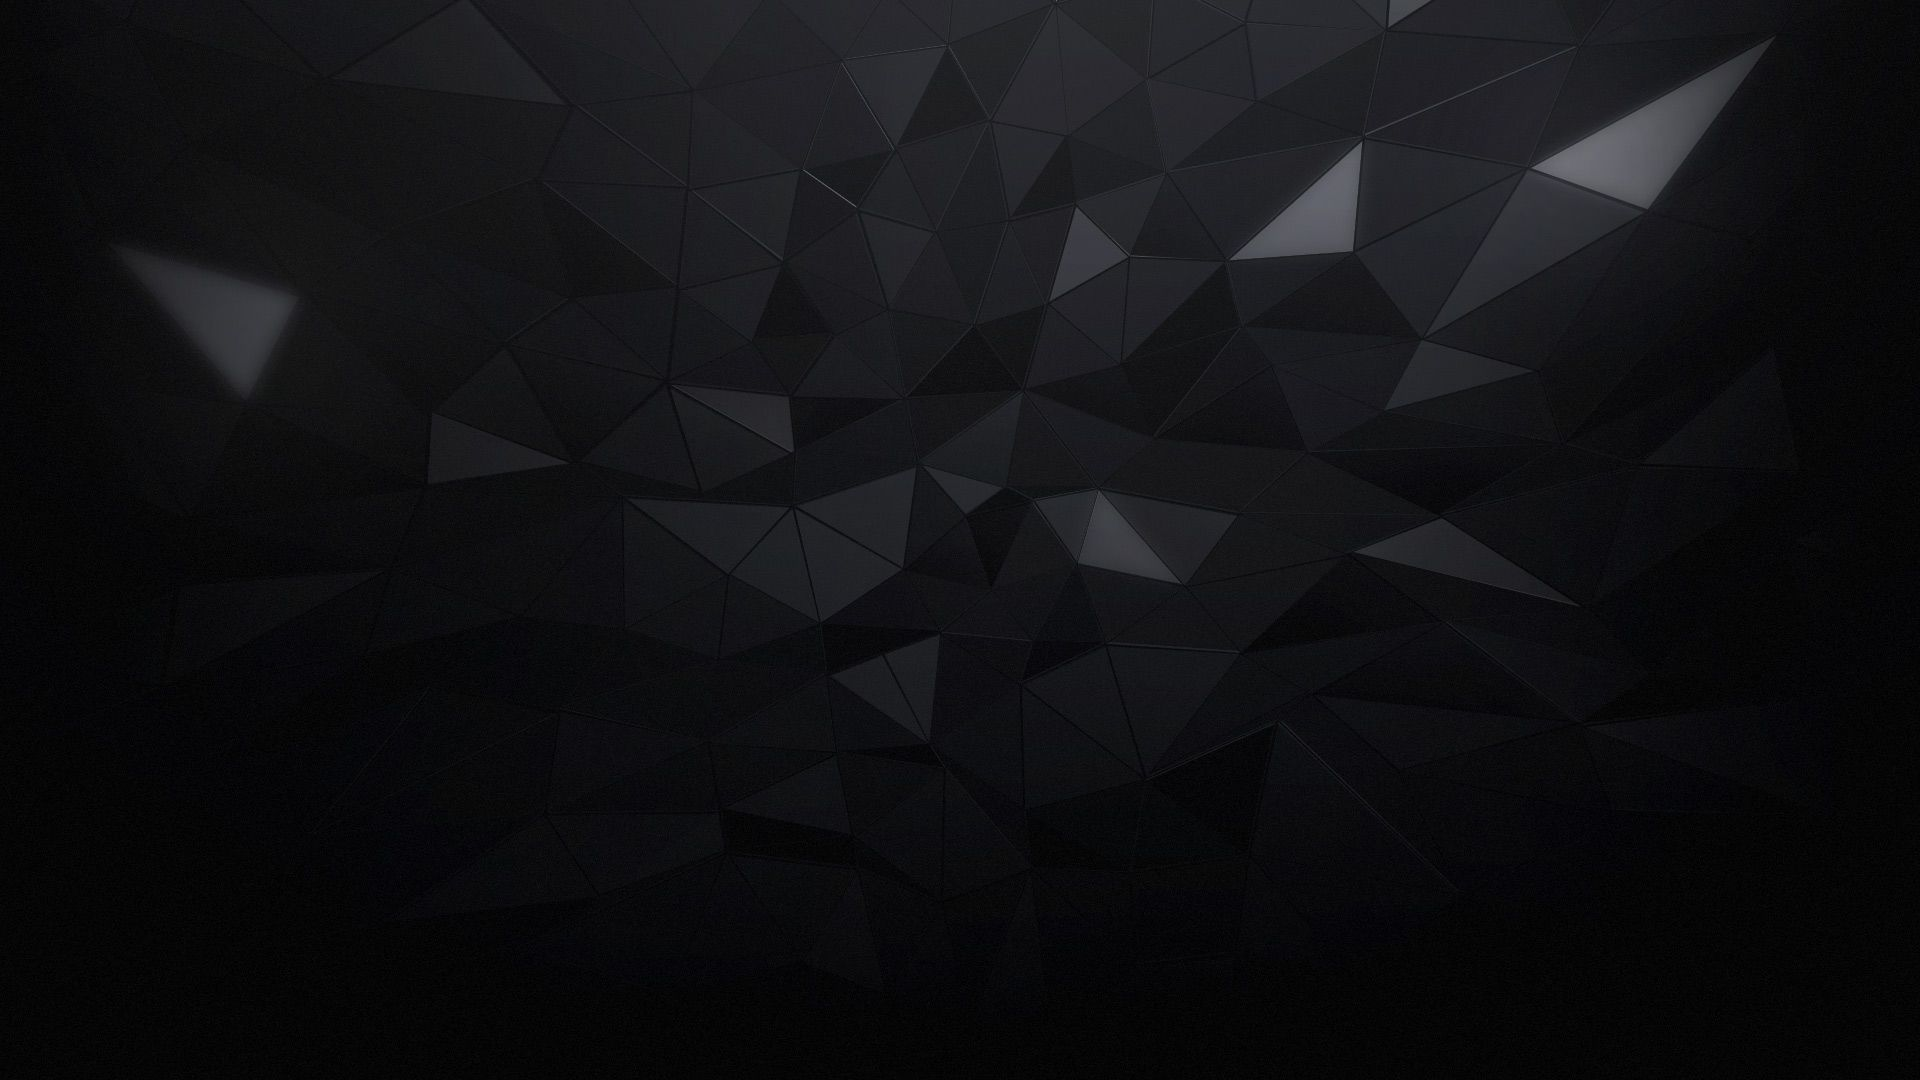 Deus Ex Titan Matrix Abstraktnoe Grafika Infografika